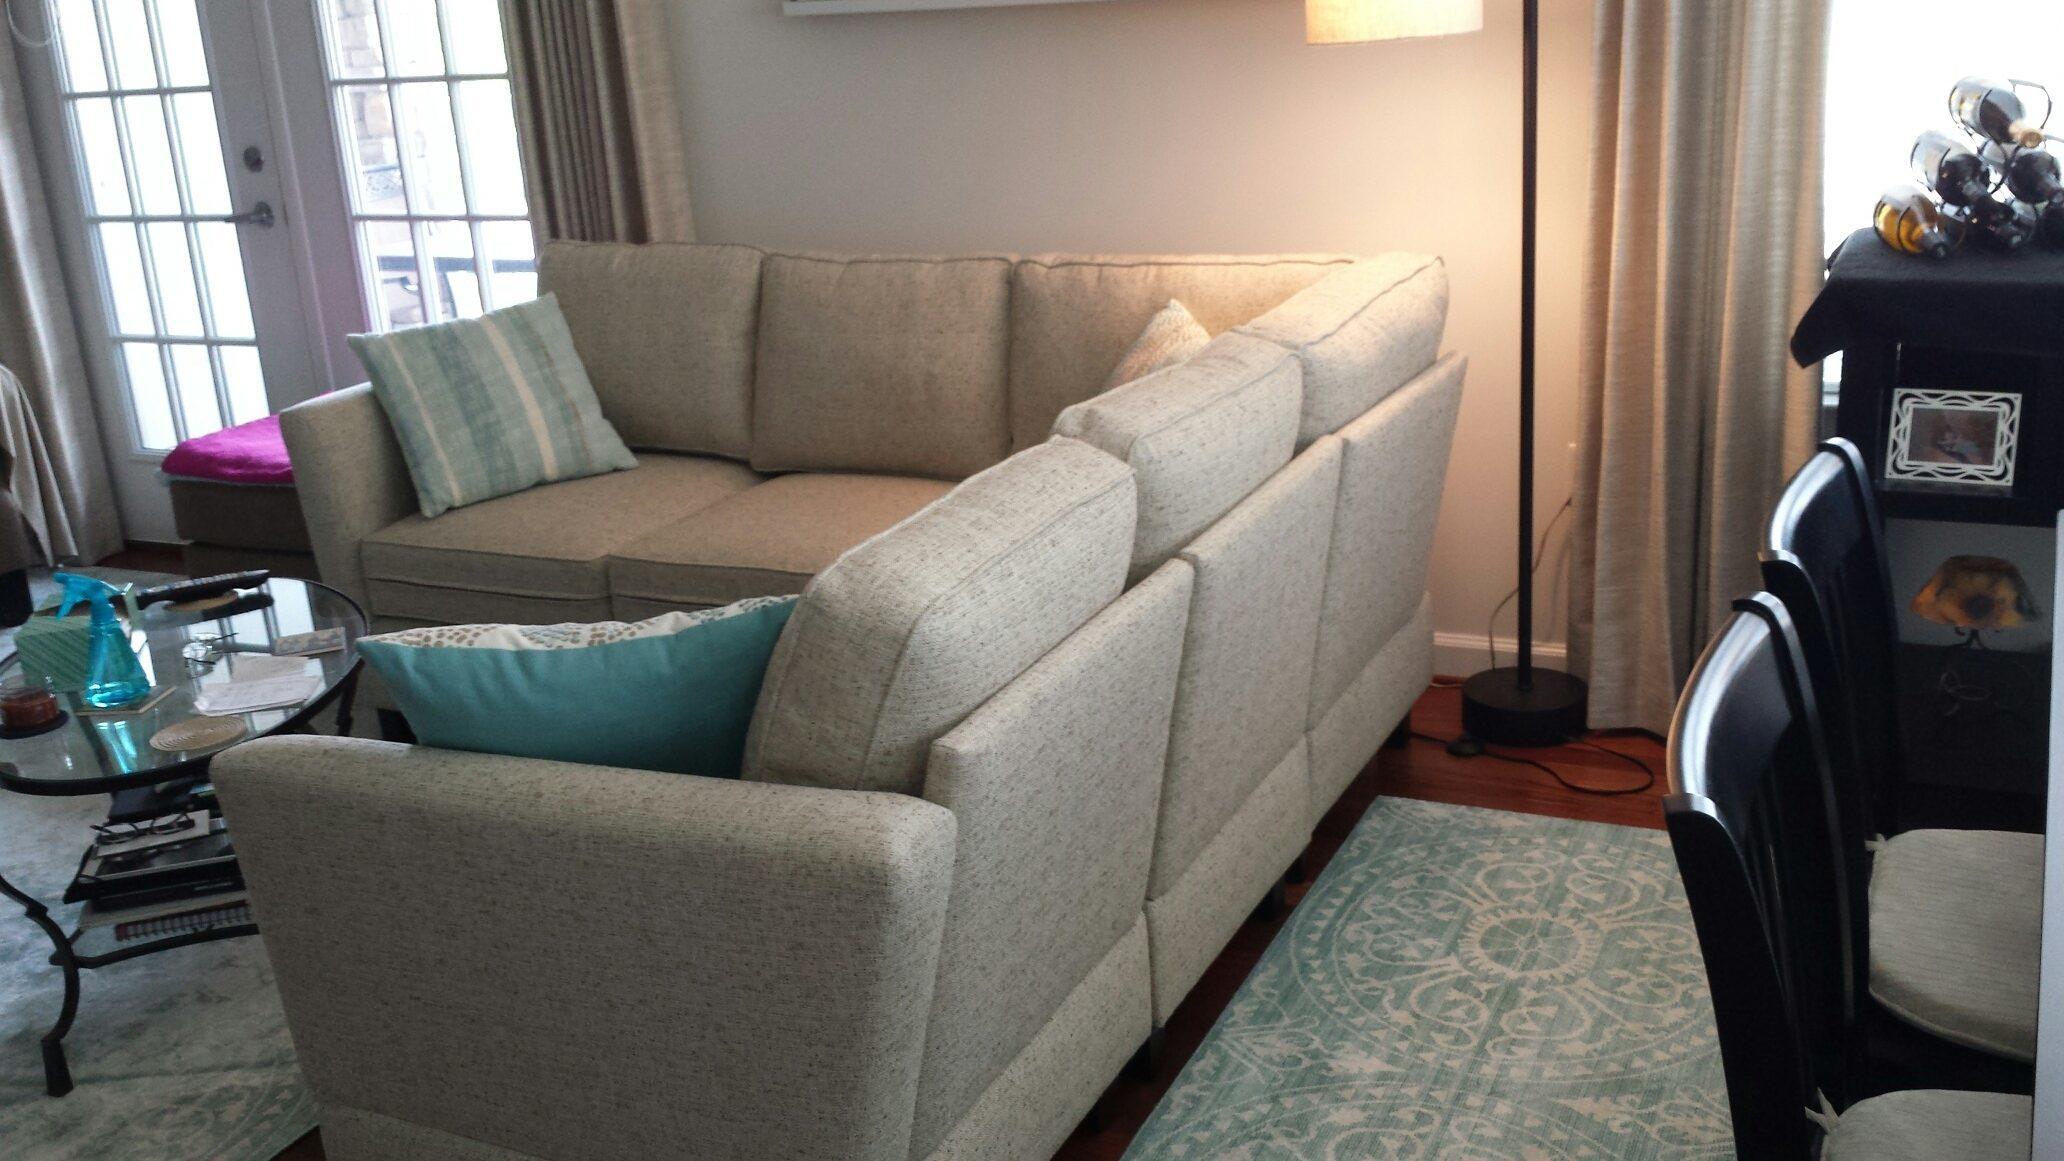 Top 78 Reviews and plaints about Simplicity Sofas